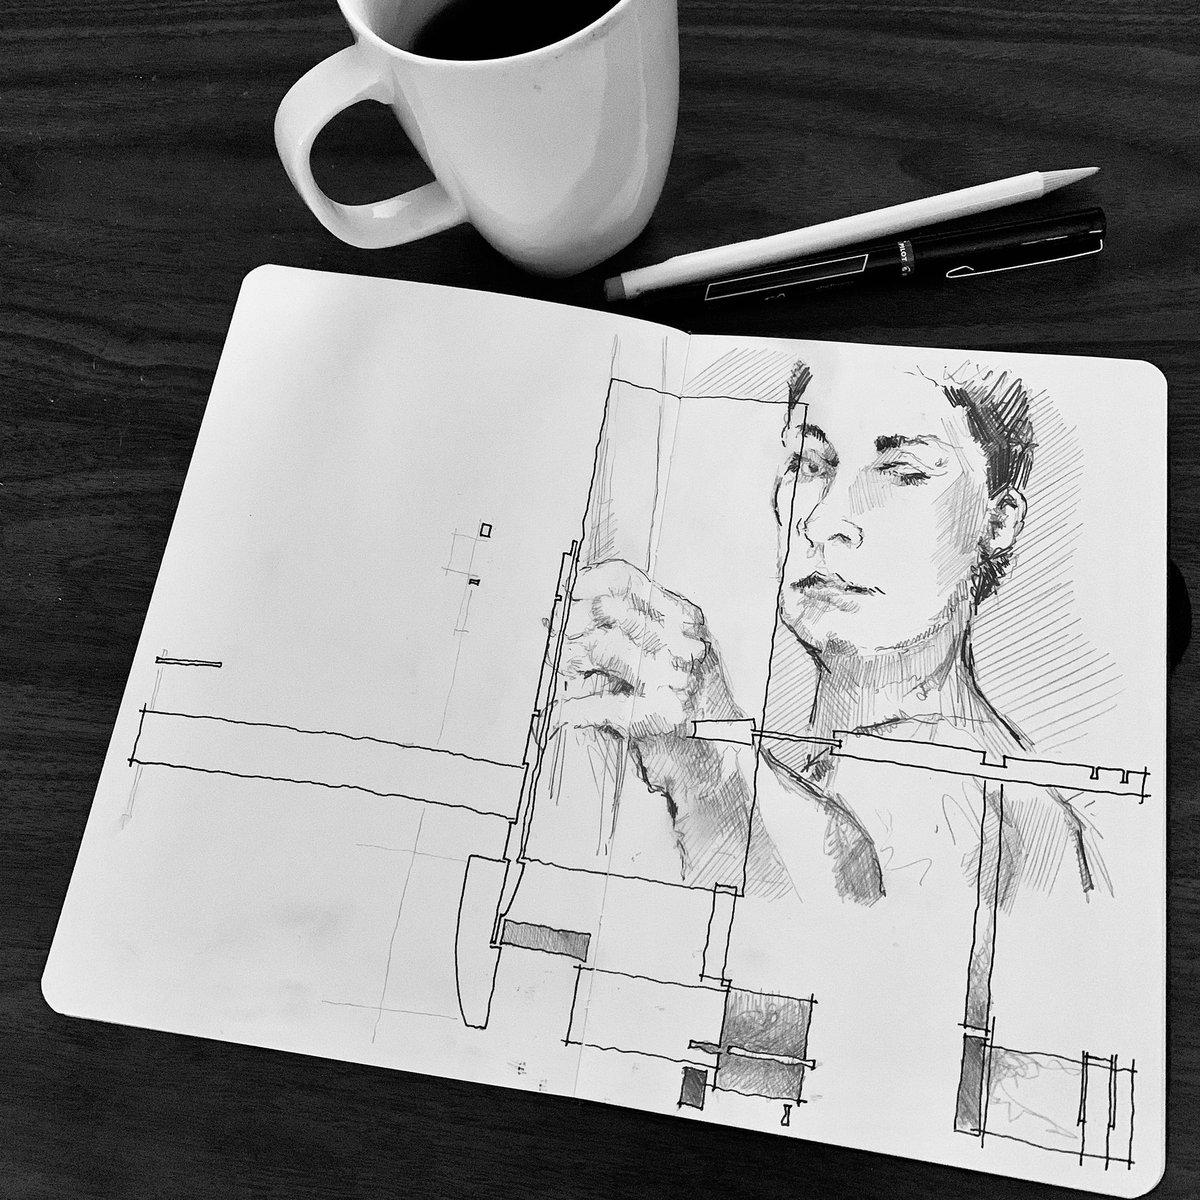 07.06.20  #coffeesketch #pencilsketch #inksketch #mixedmedia #figure #figuredrawing  #formspaceorder #hybriddrawing #draweveryday #dailysketch #quicksketch #art #architecture #podcastpic.twitter.com/rudsZnKOYU